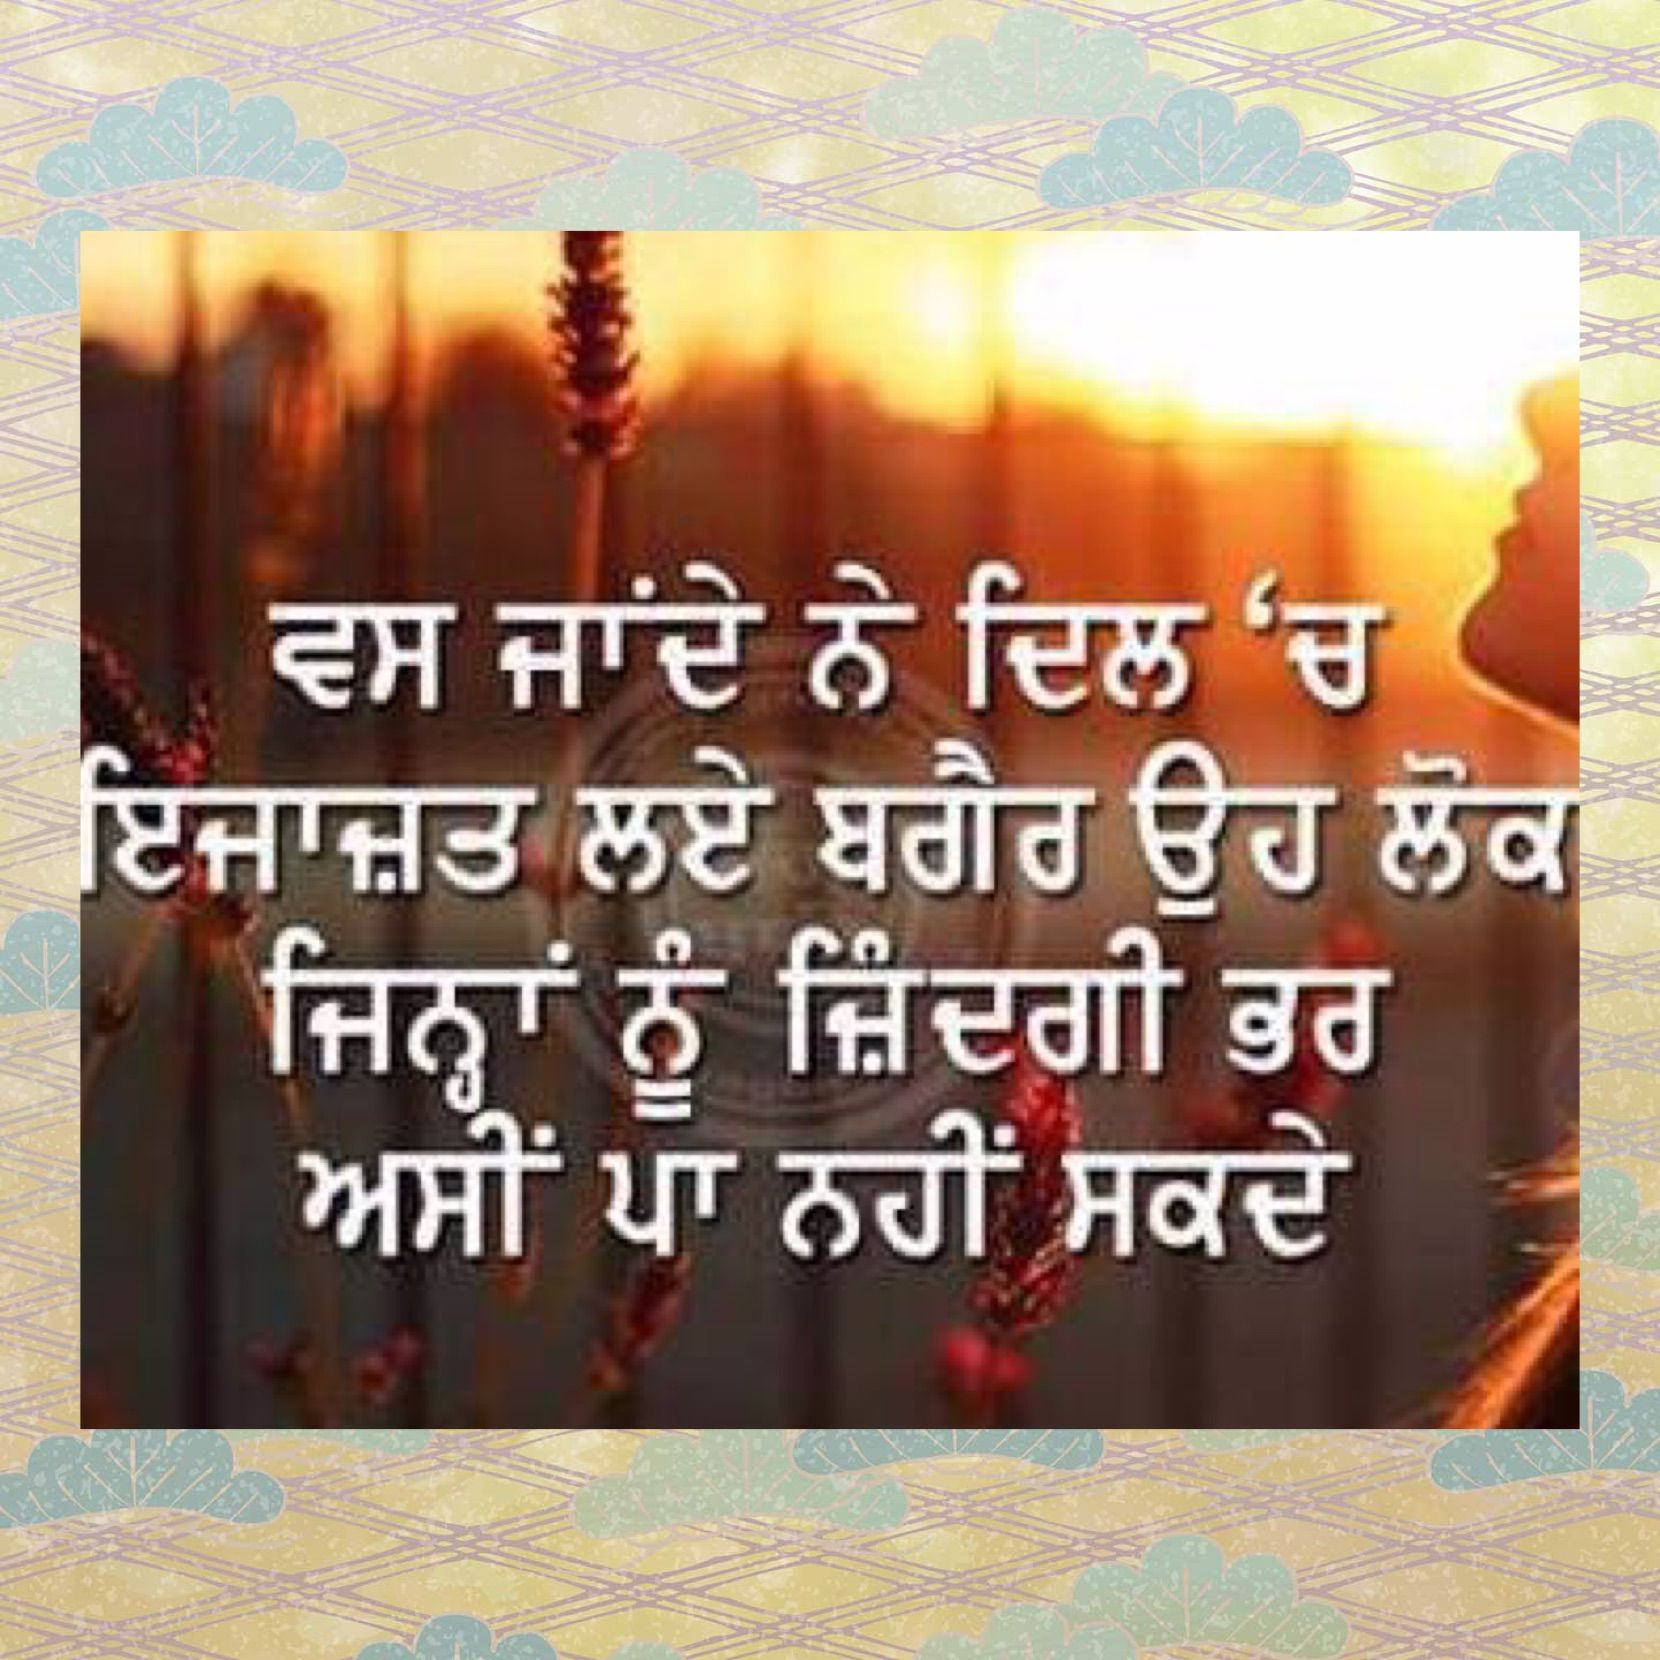 Sad Romantic Quotes In Hindi: Pin By Baljinder Dhillon On Punjabi Thought